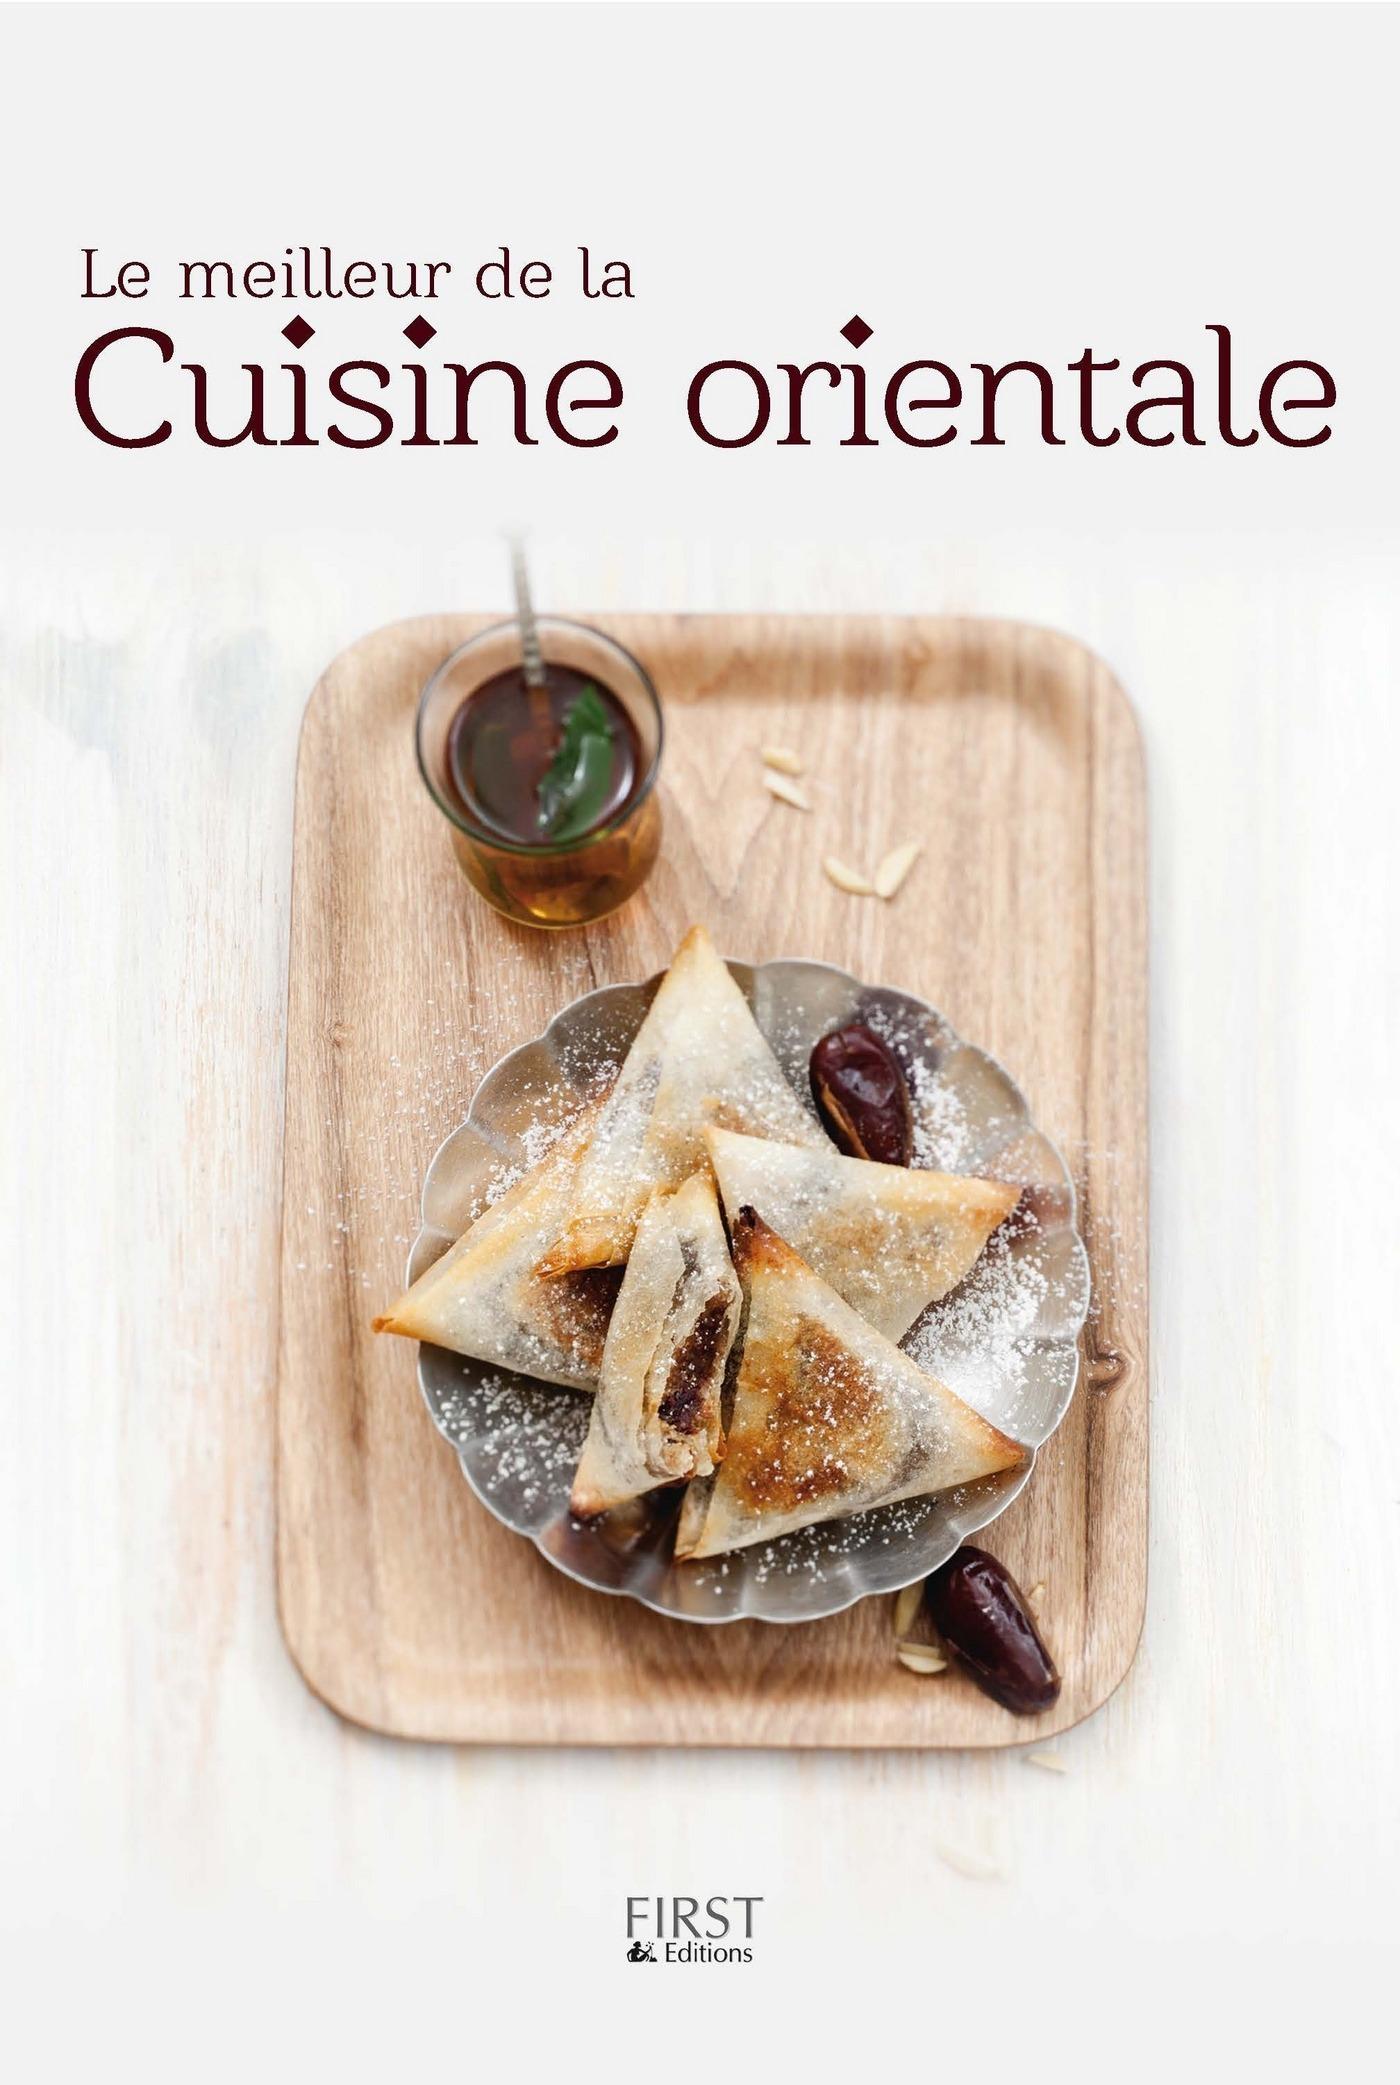 Le meilleur de la cuisine orientale